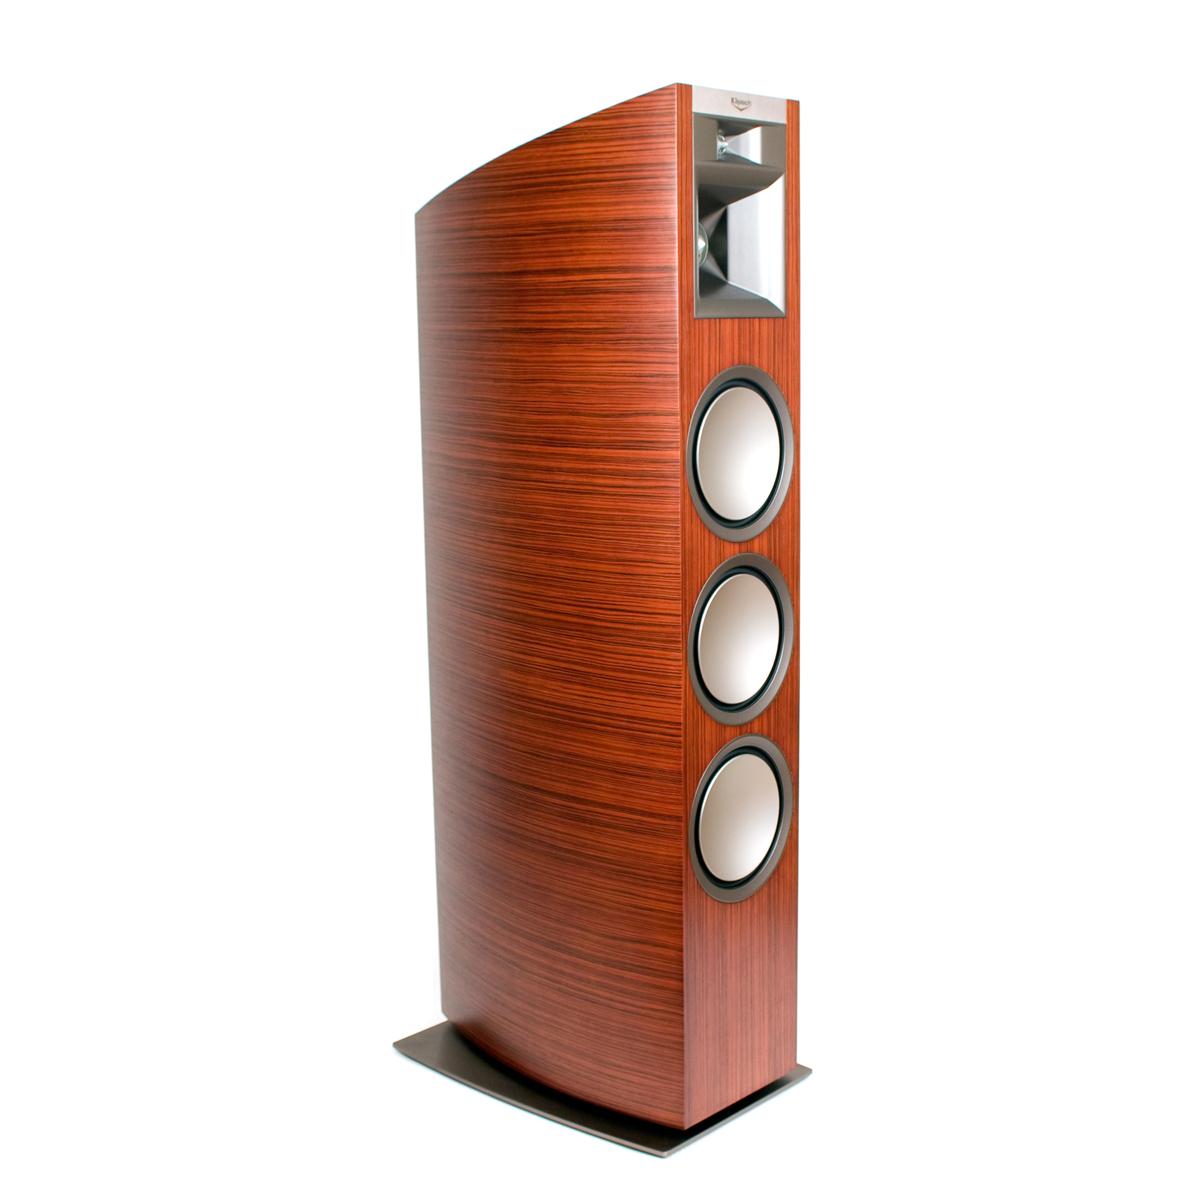 Klipsch Palladium Speakers - any experience? - 2 Channel